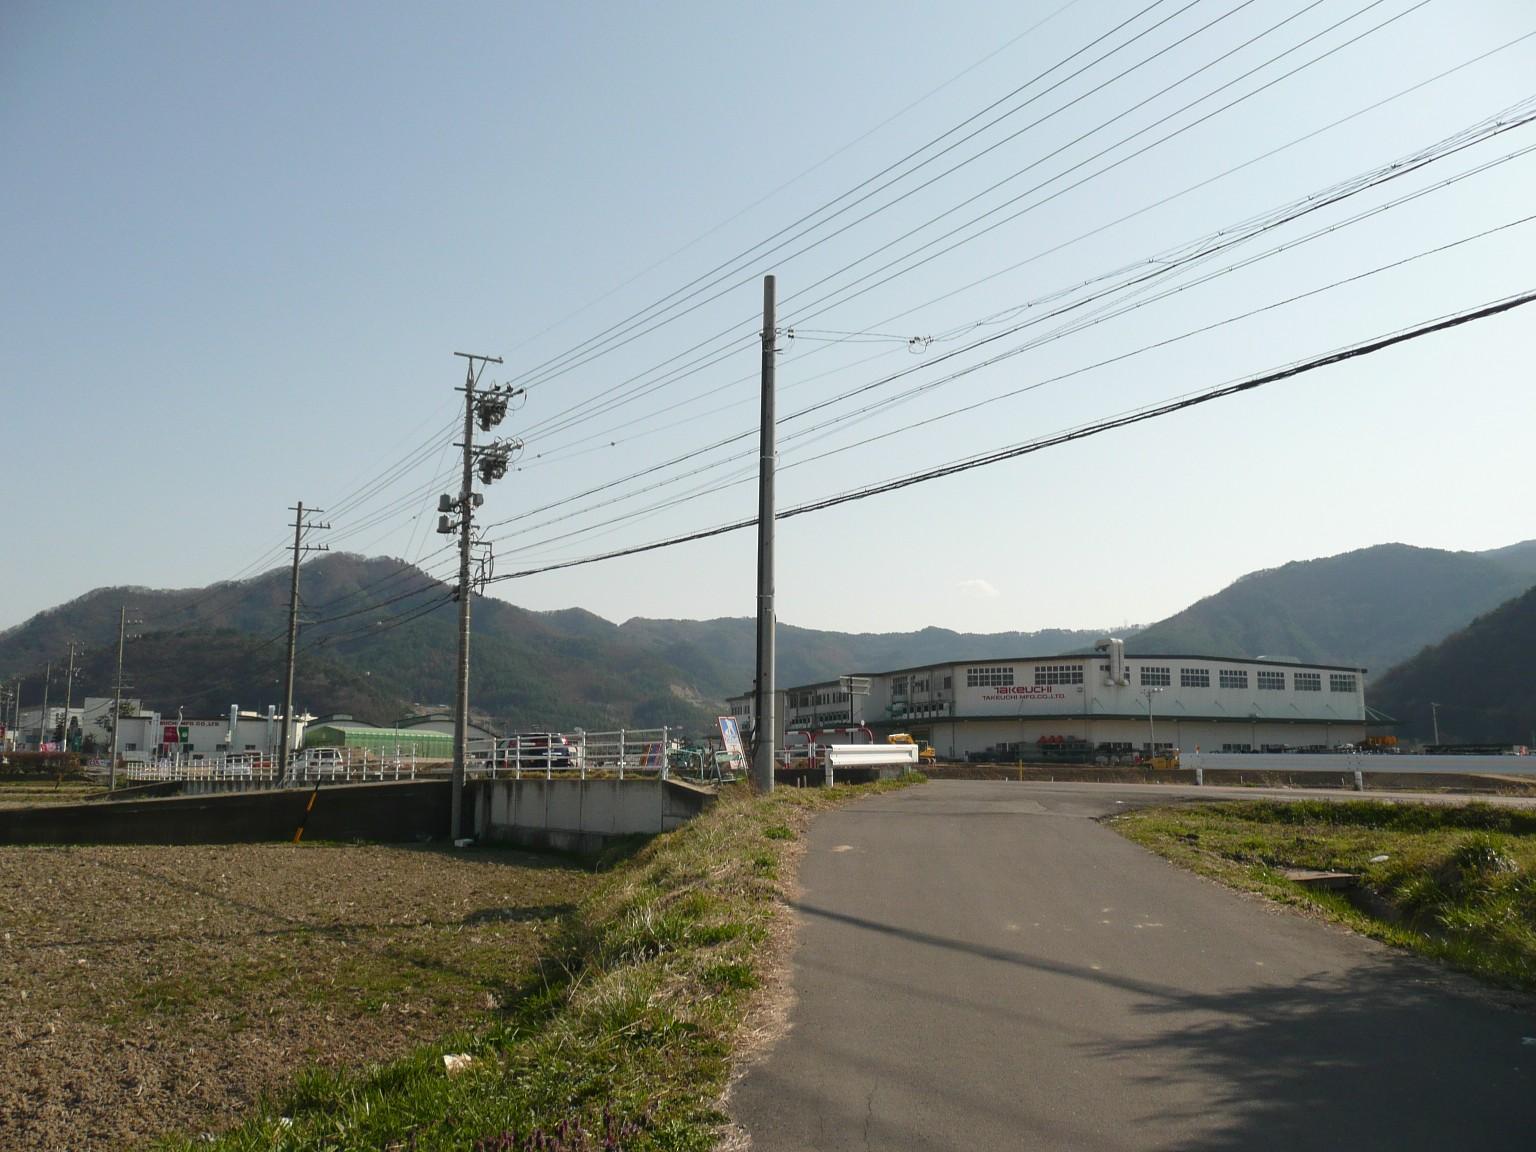 Takeuchi Manufacturing - Wikipedia